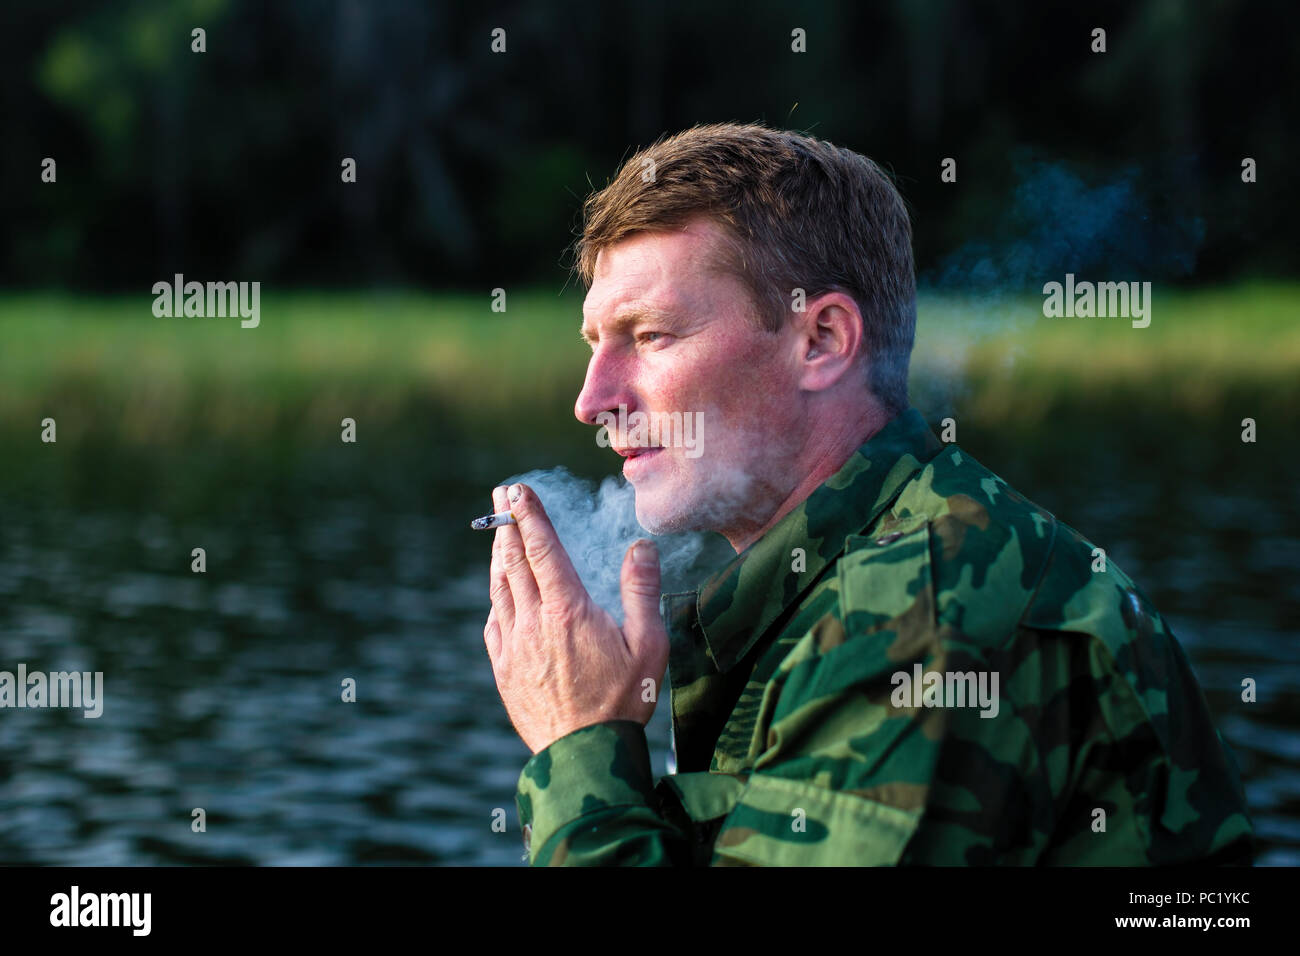 Man smoking close-up, camouflage clothing, outdoor. - Stock Image